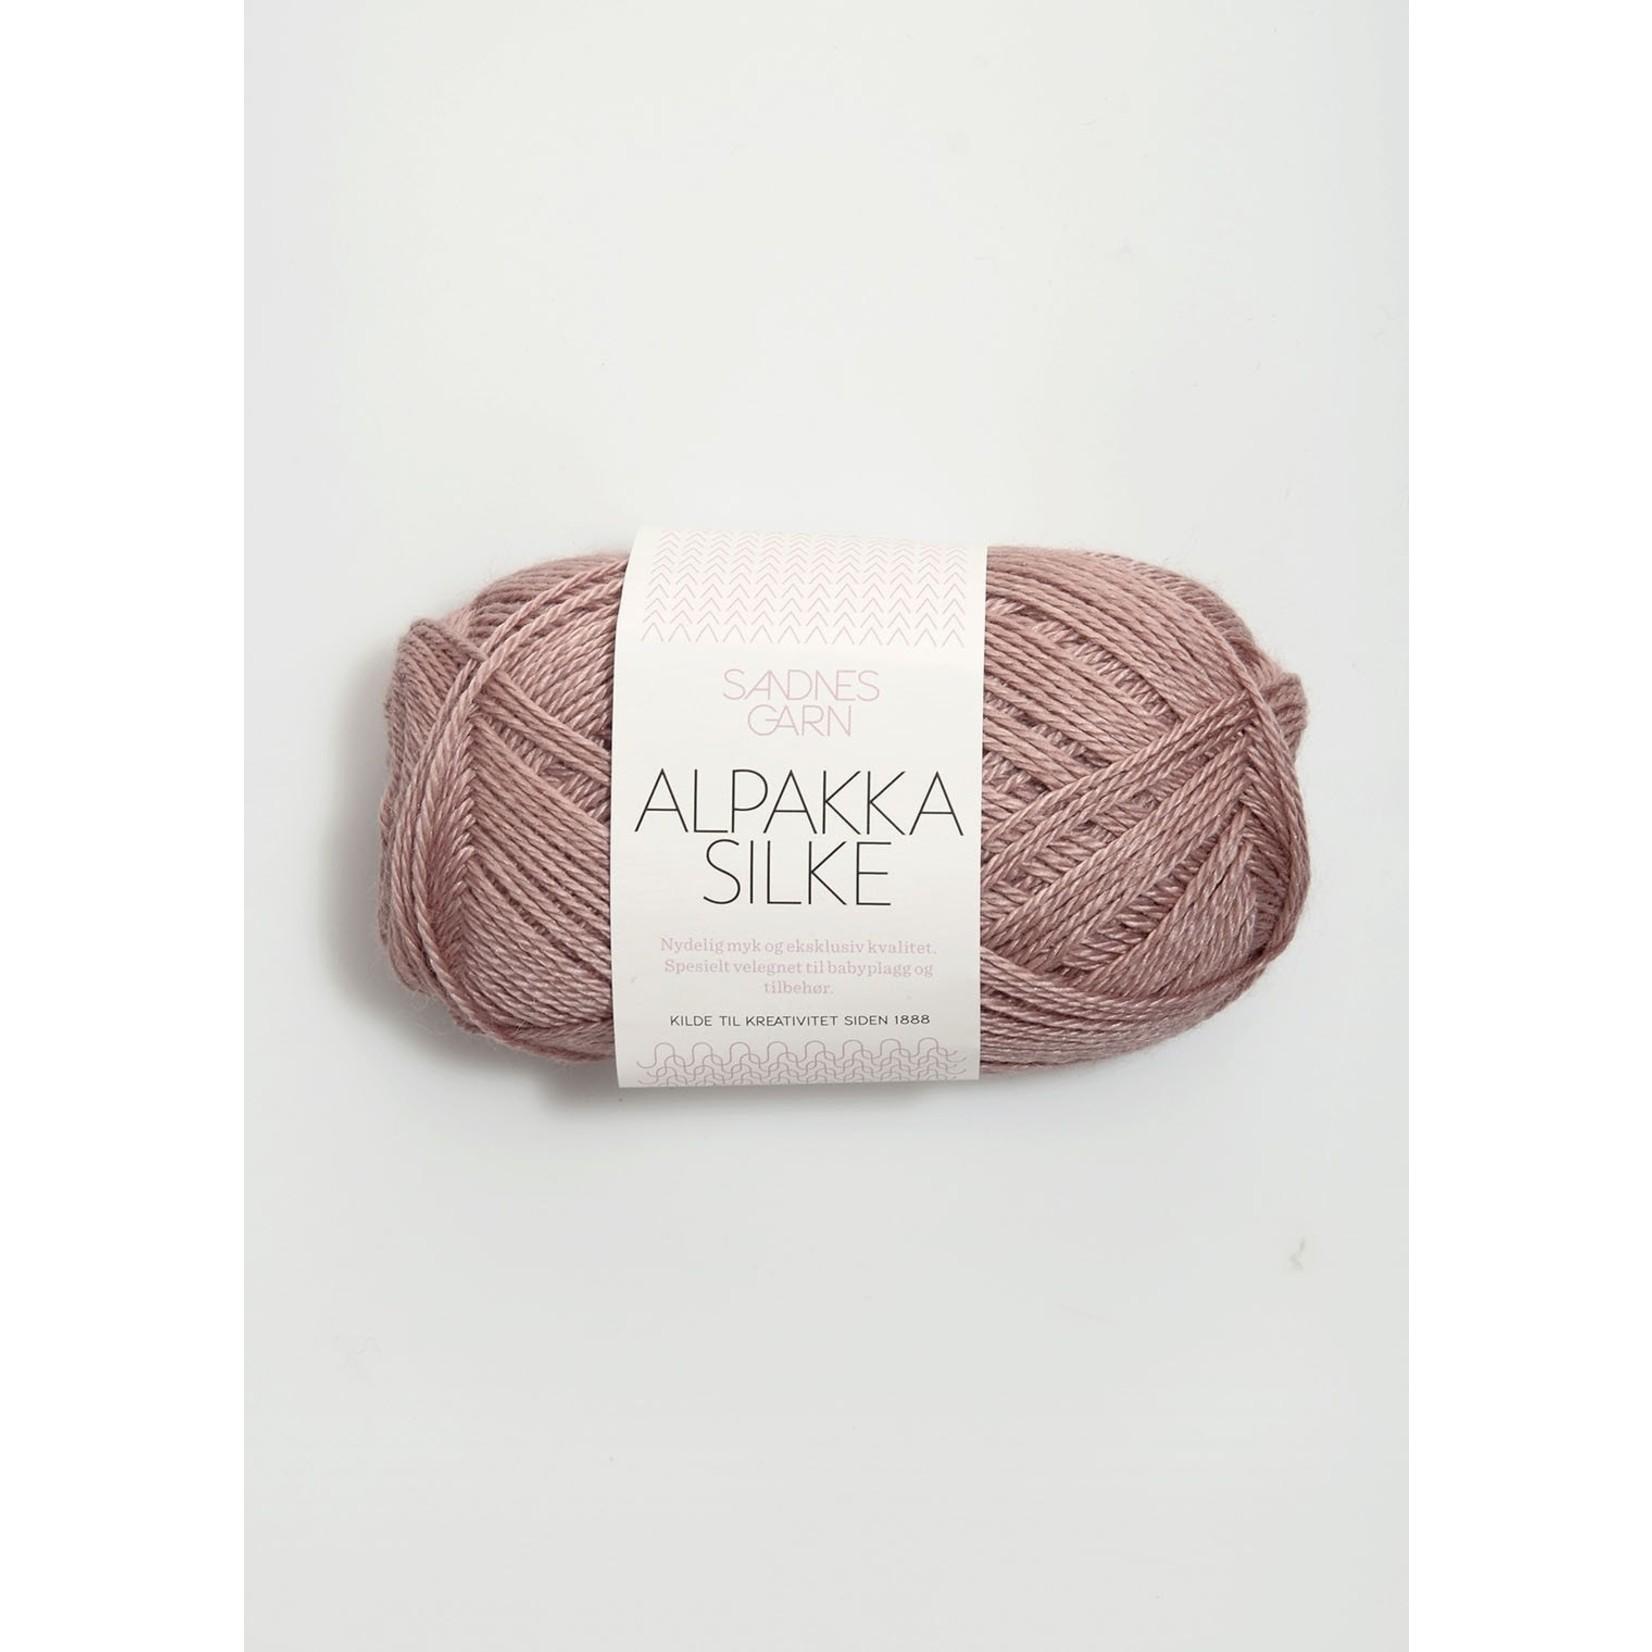 Sandnes Garn Alpakka Silke, 4331, Old Pink